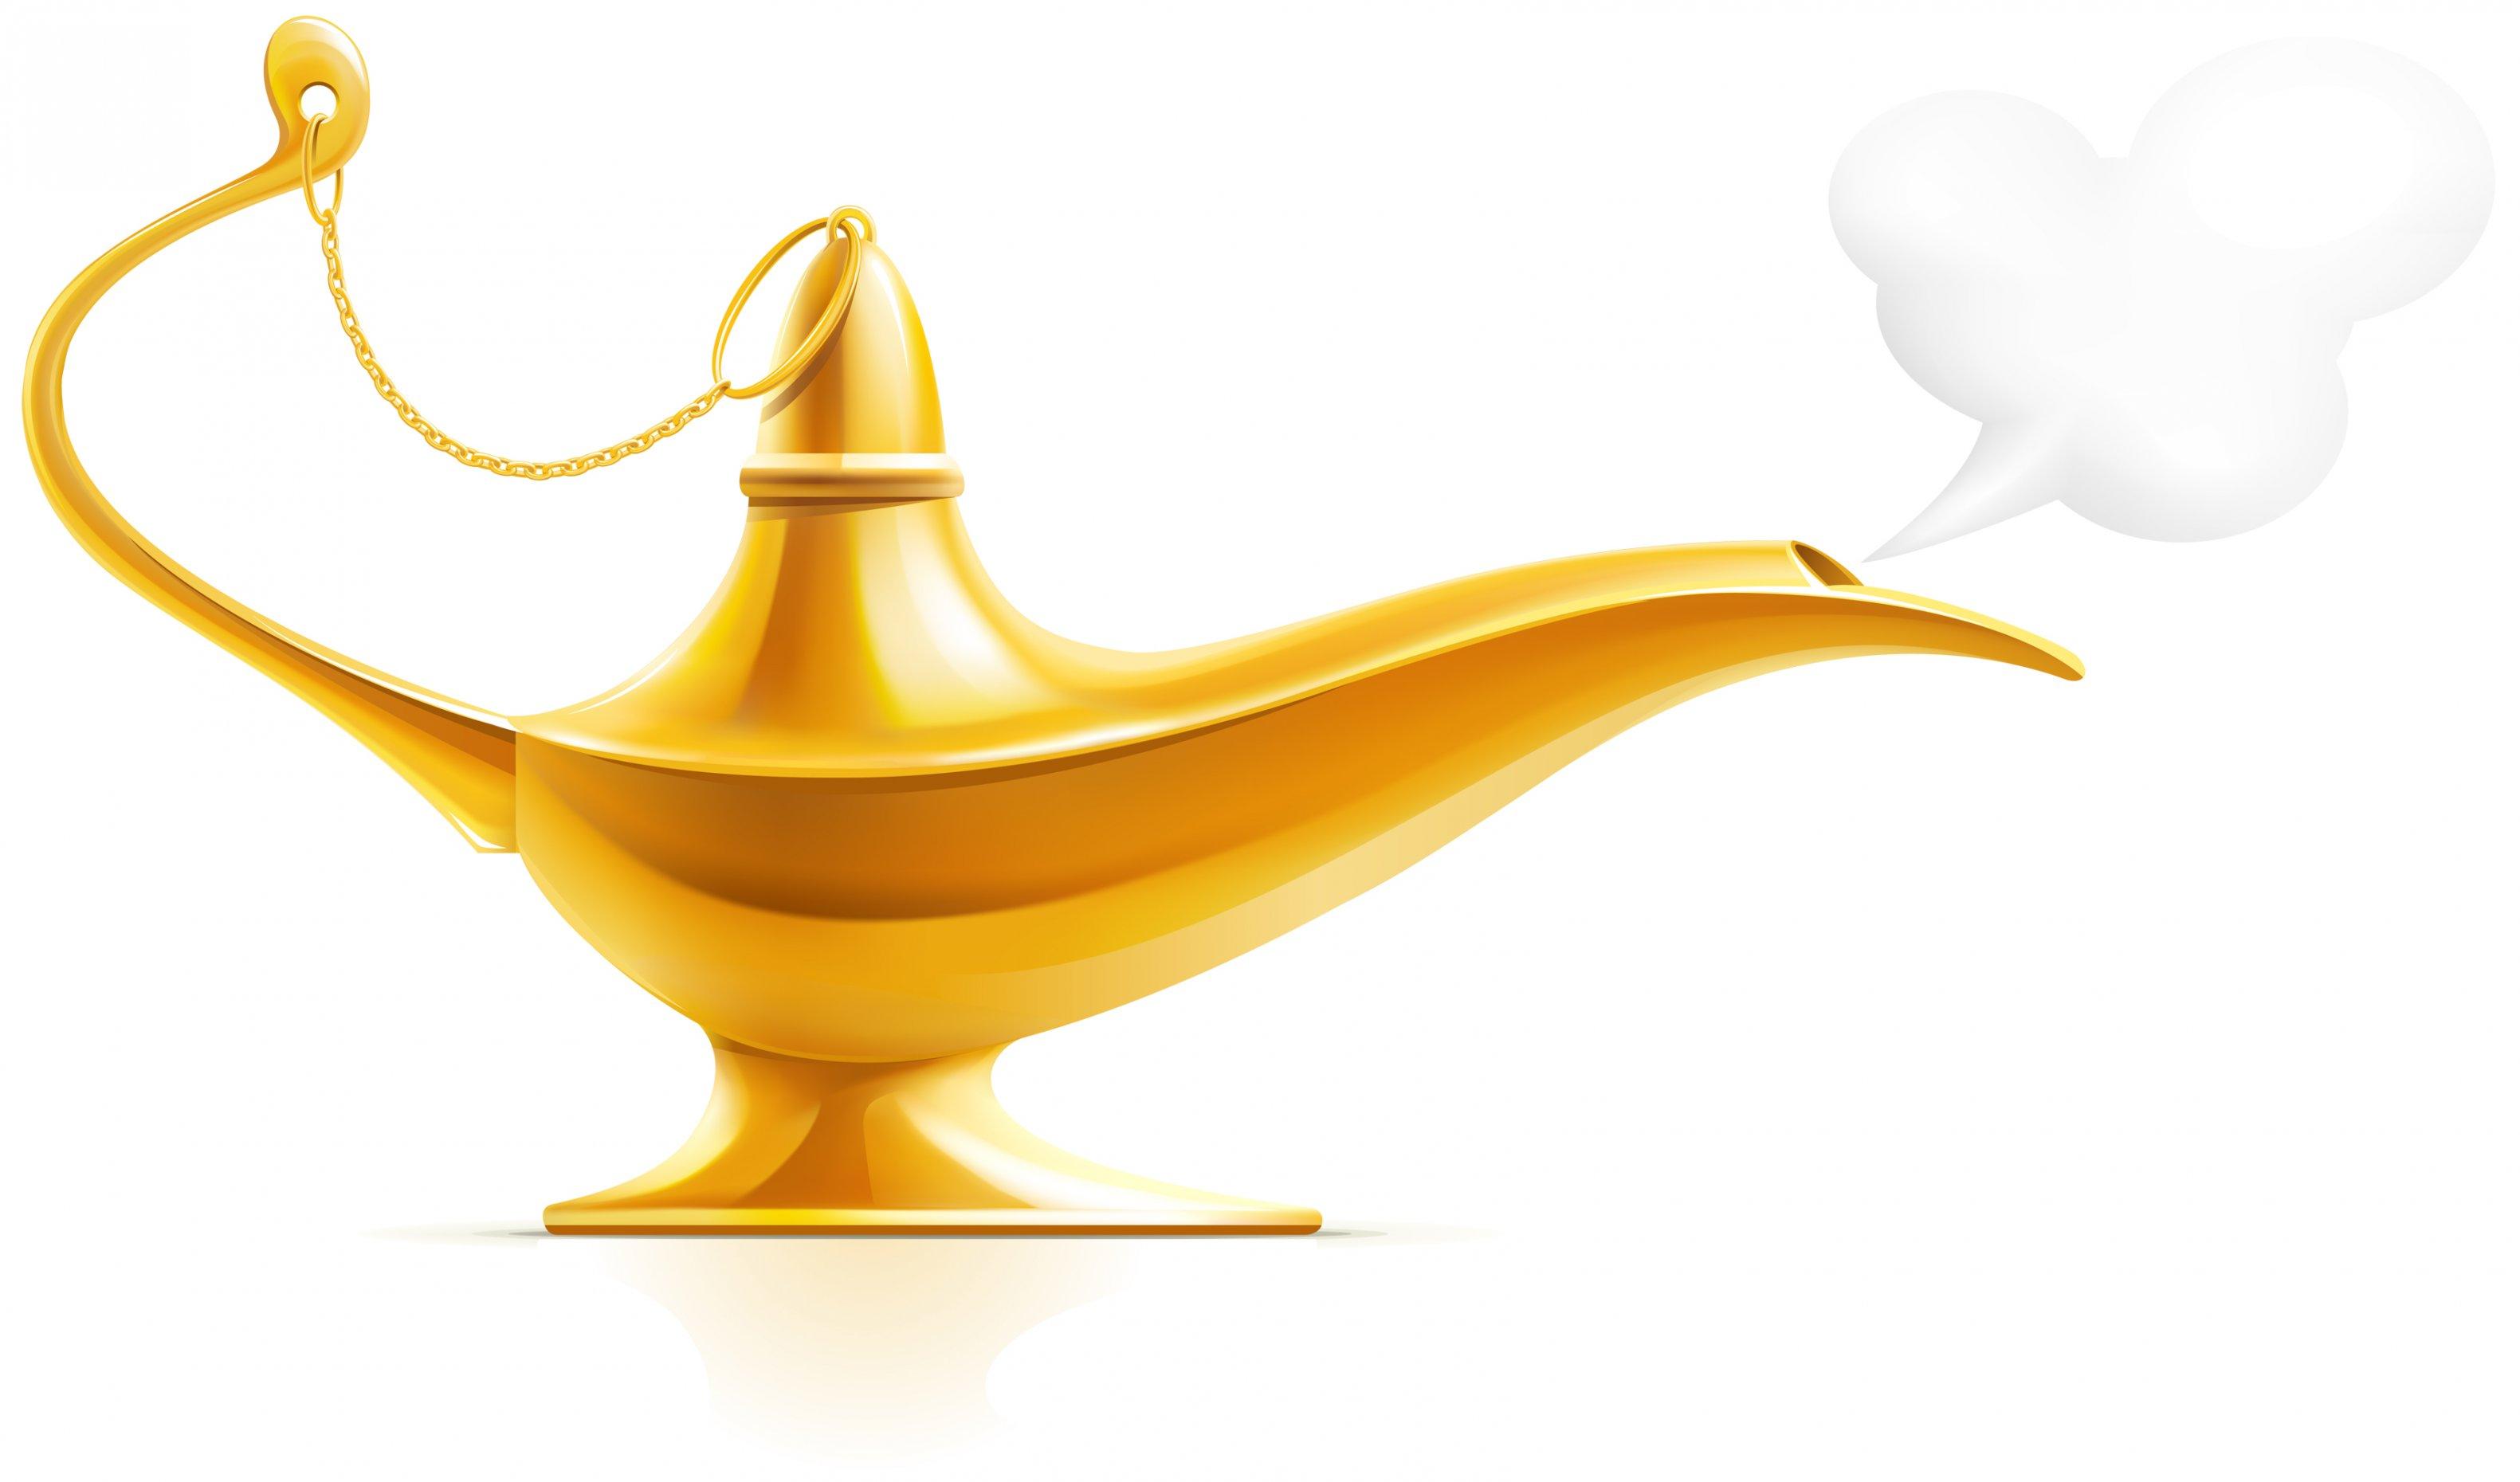 3162x1860 Genie Lamp Clipart Free Download Clip Art